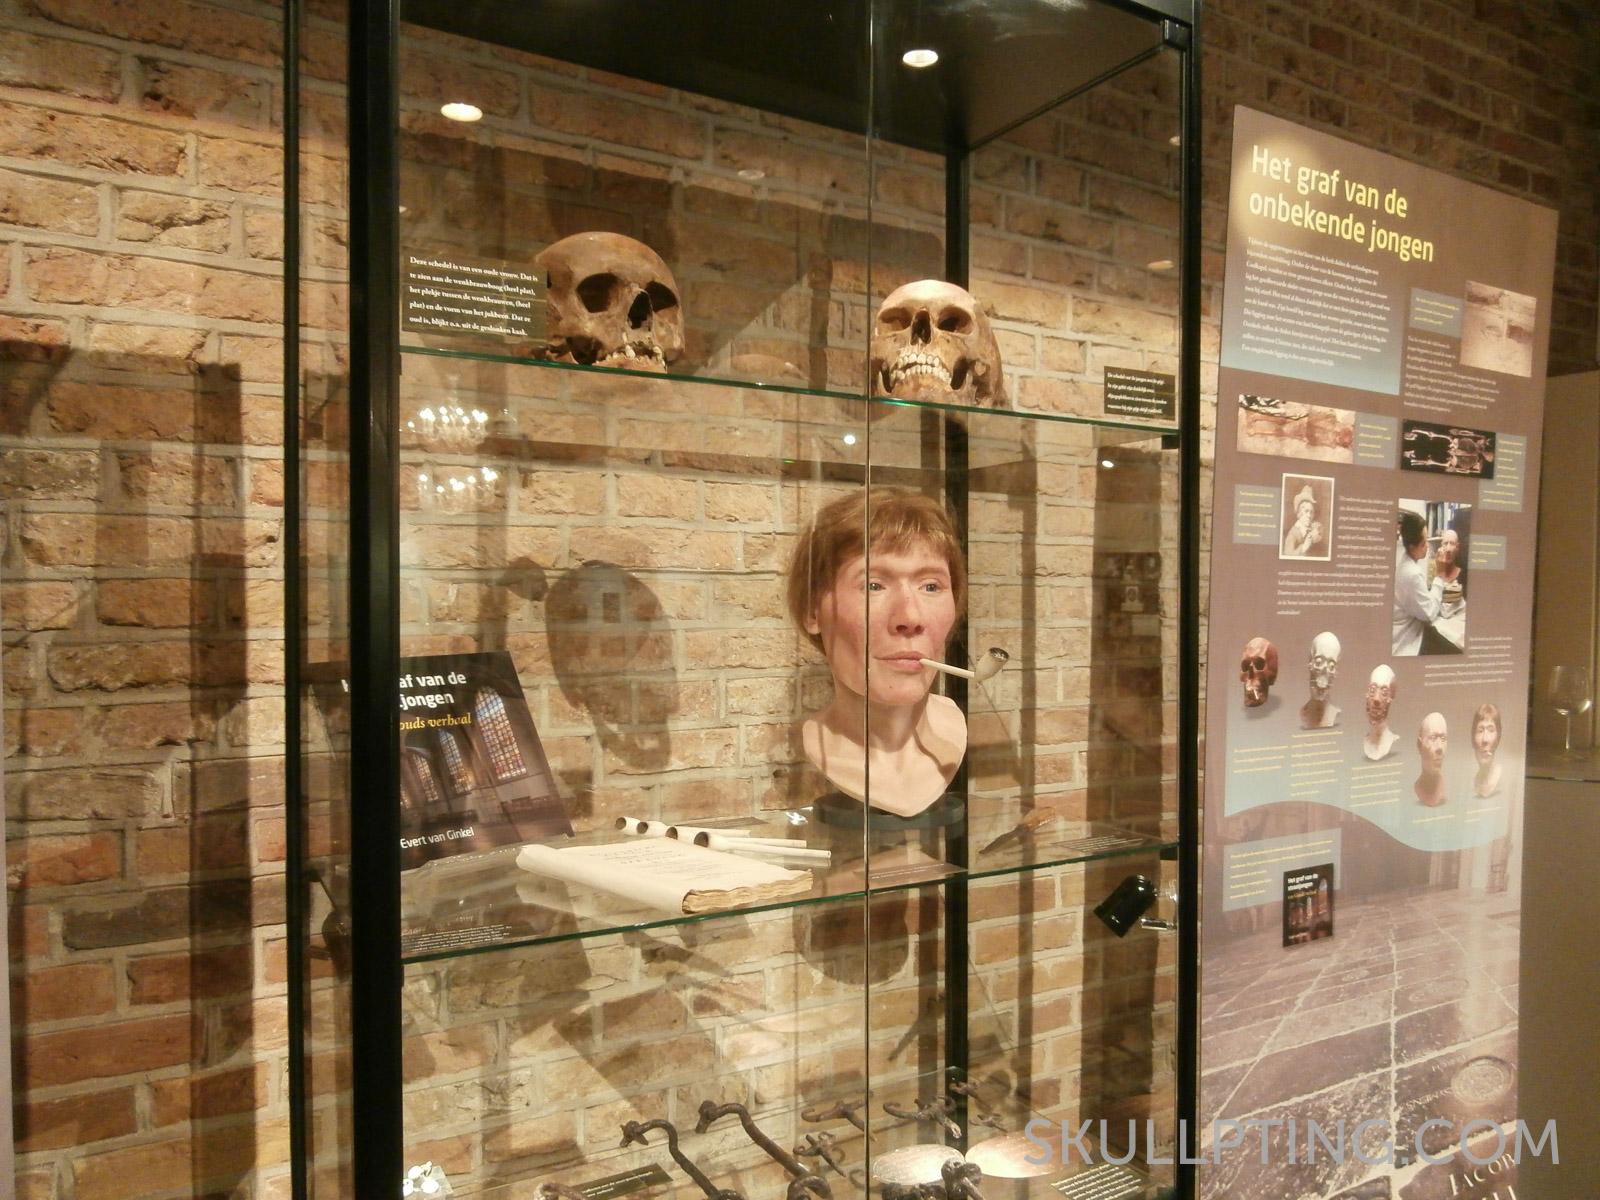 The exhibition in the Sint-Janskerk in Gouda.